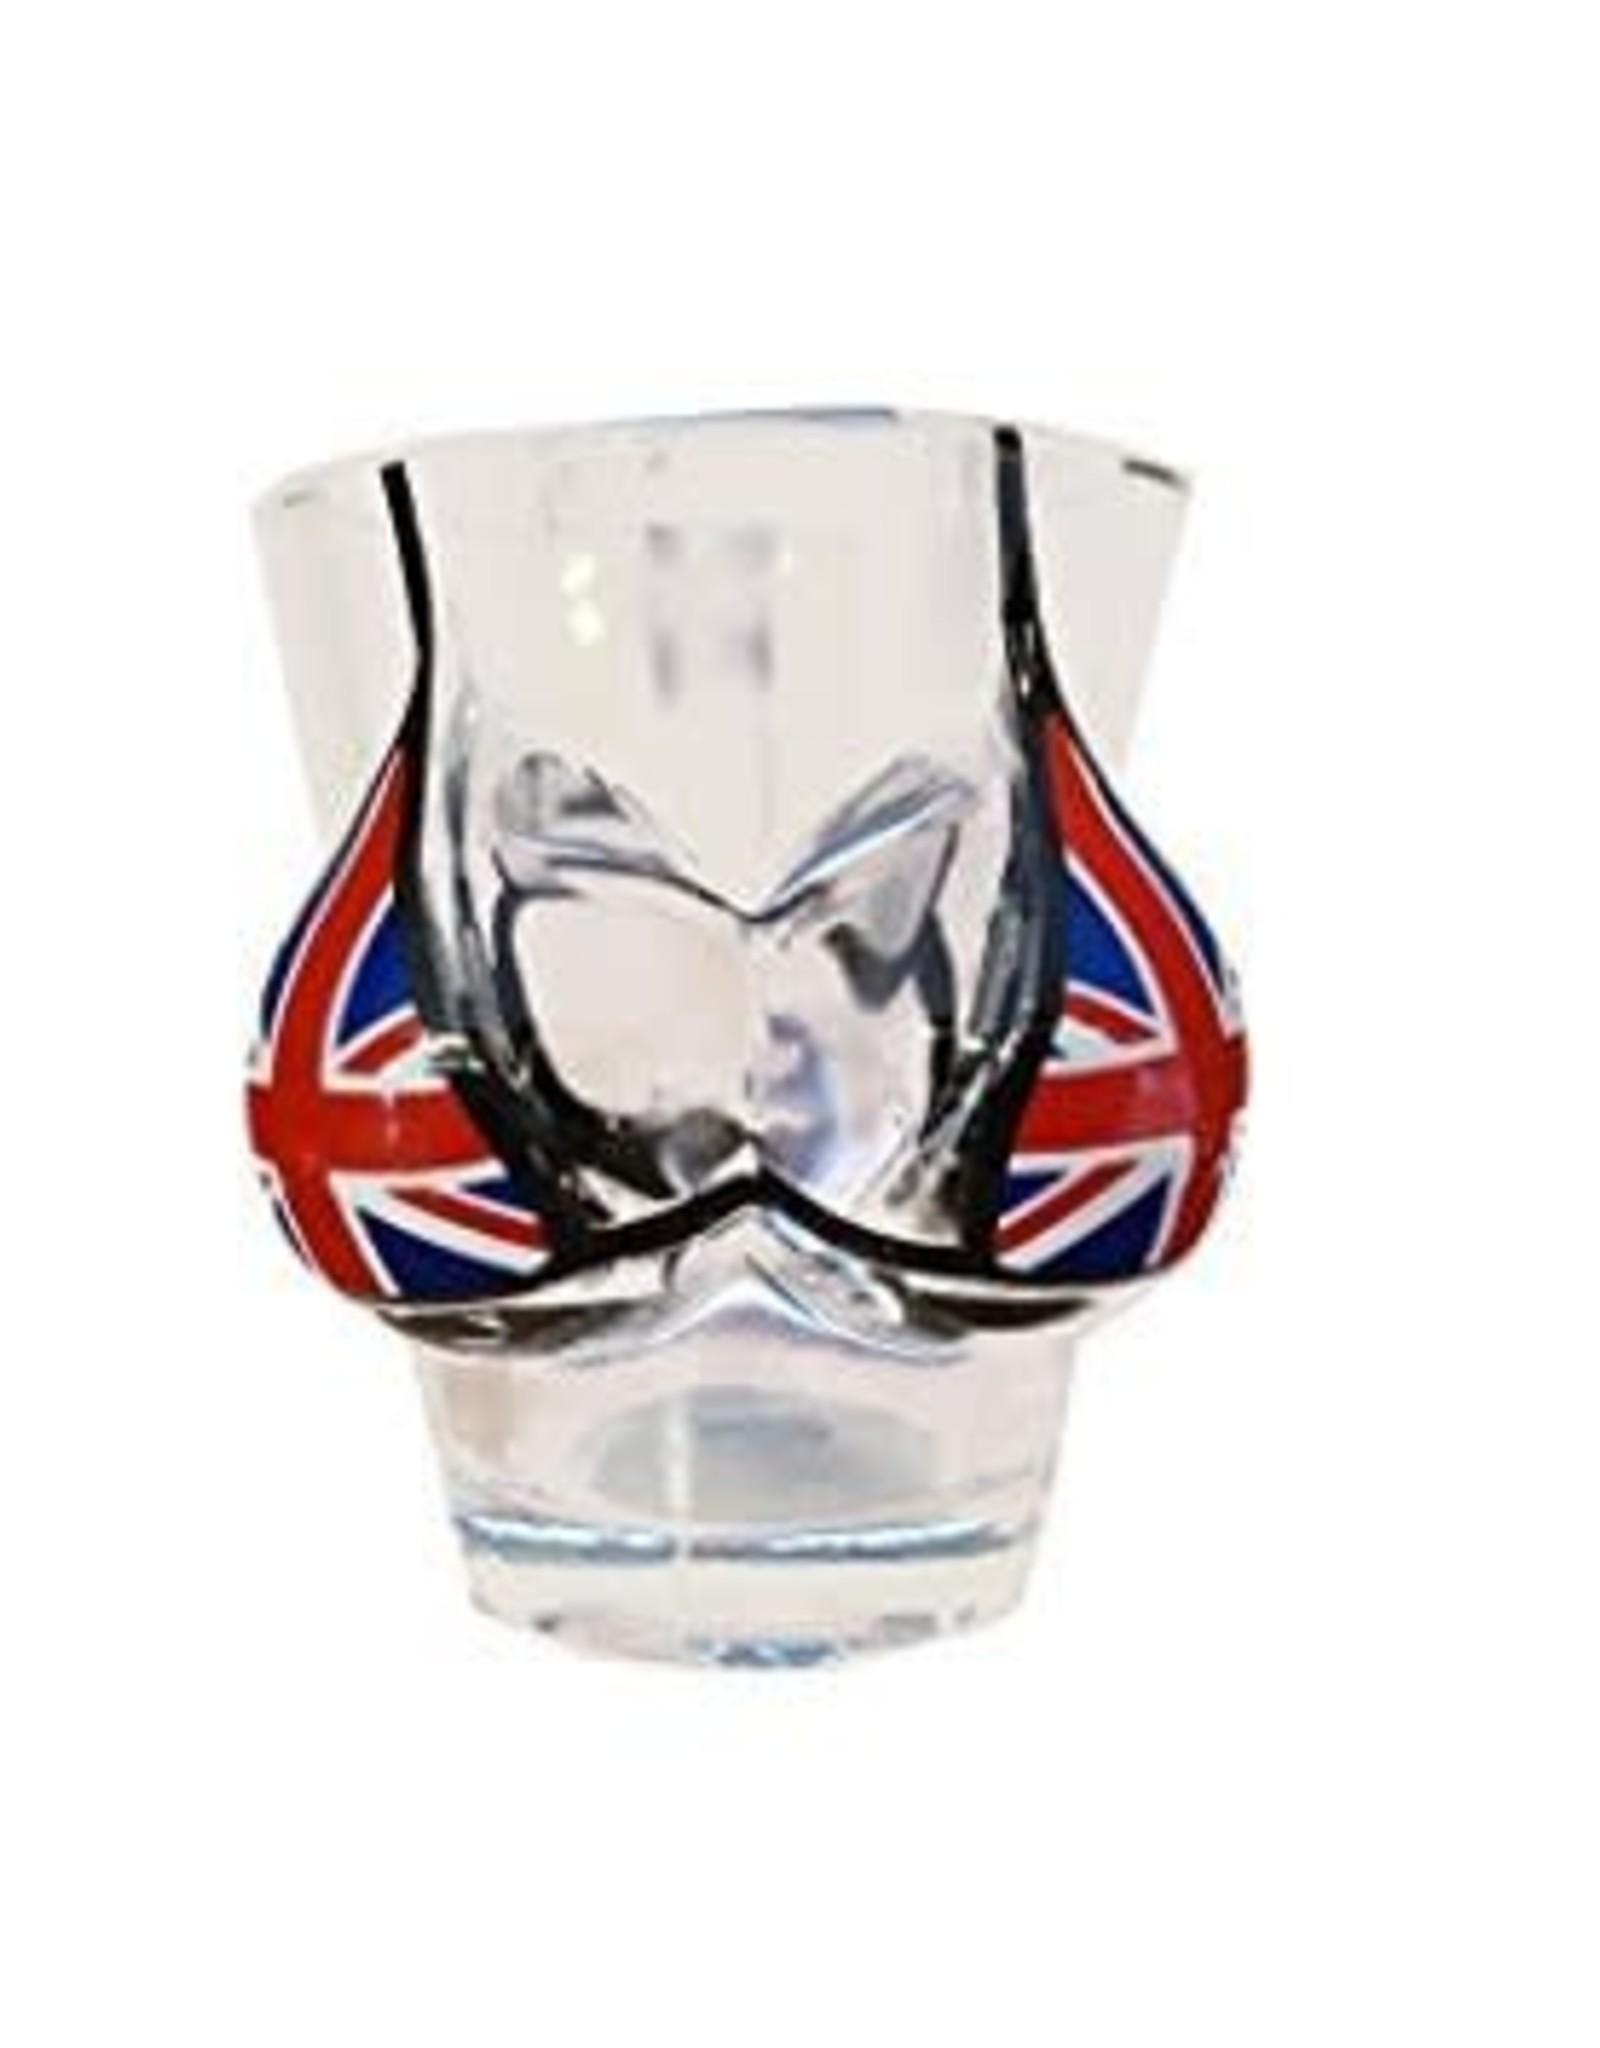 Elgate Union Jack Boobies Shotglass